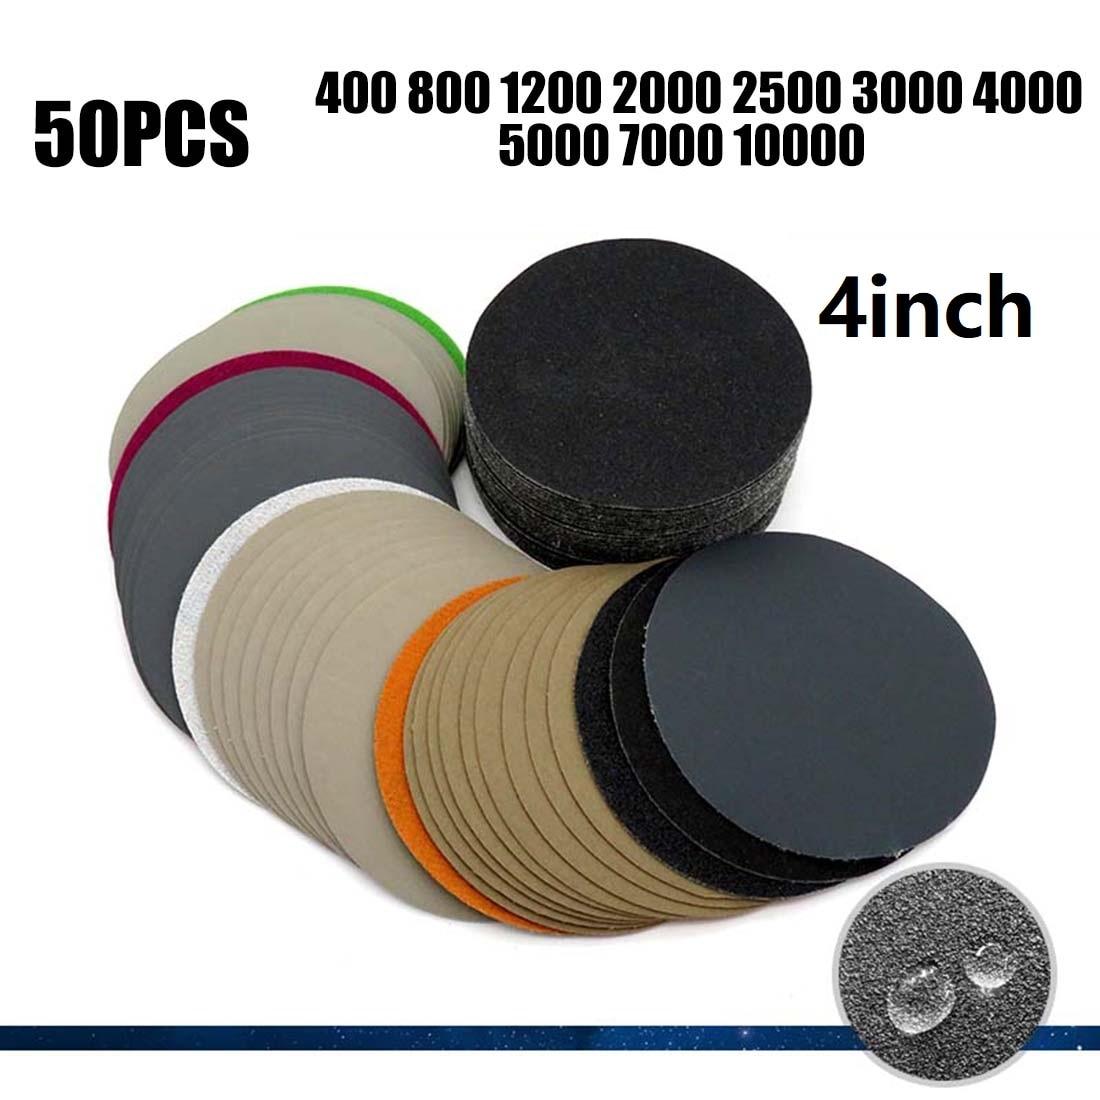 50pcs Set 4 Inch 100mm Waterproof Sandpaper 400-10000 Grit Hook & Loop Sanding Discs High Flexibility